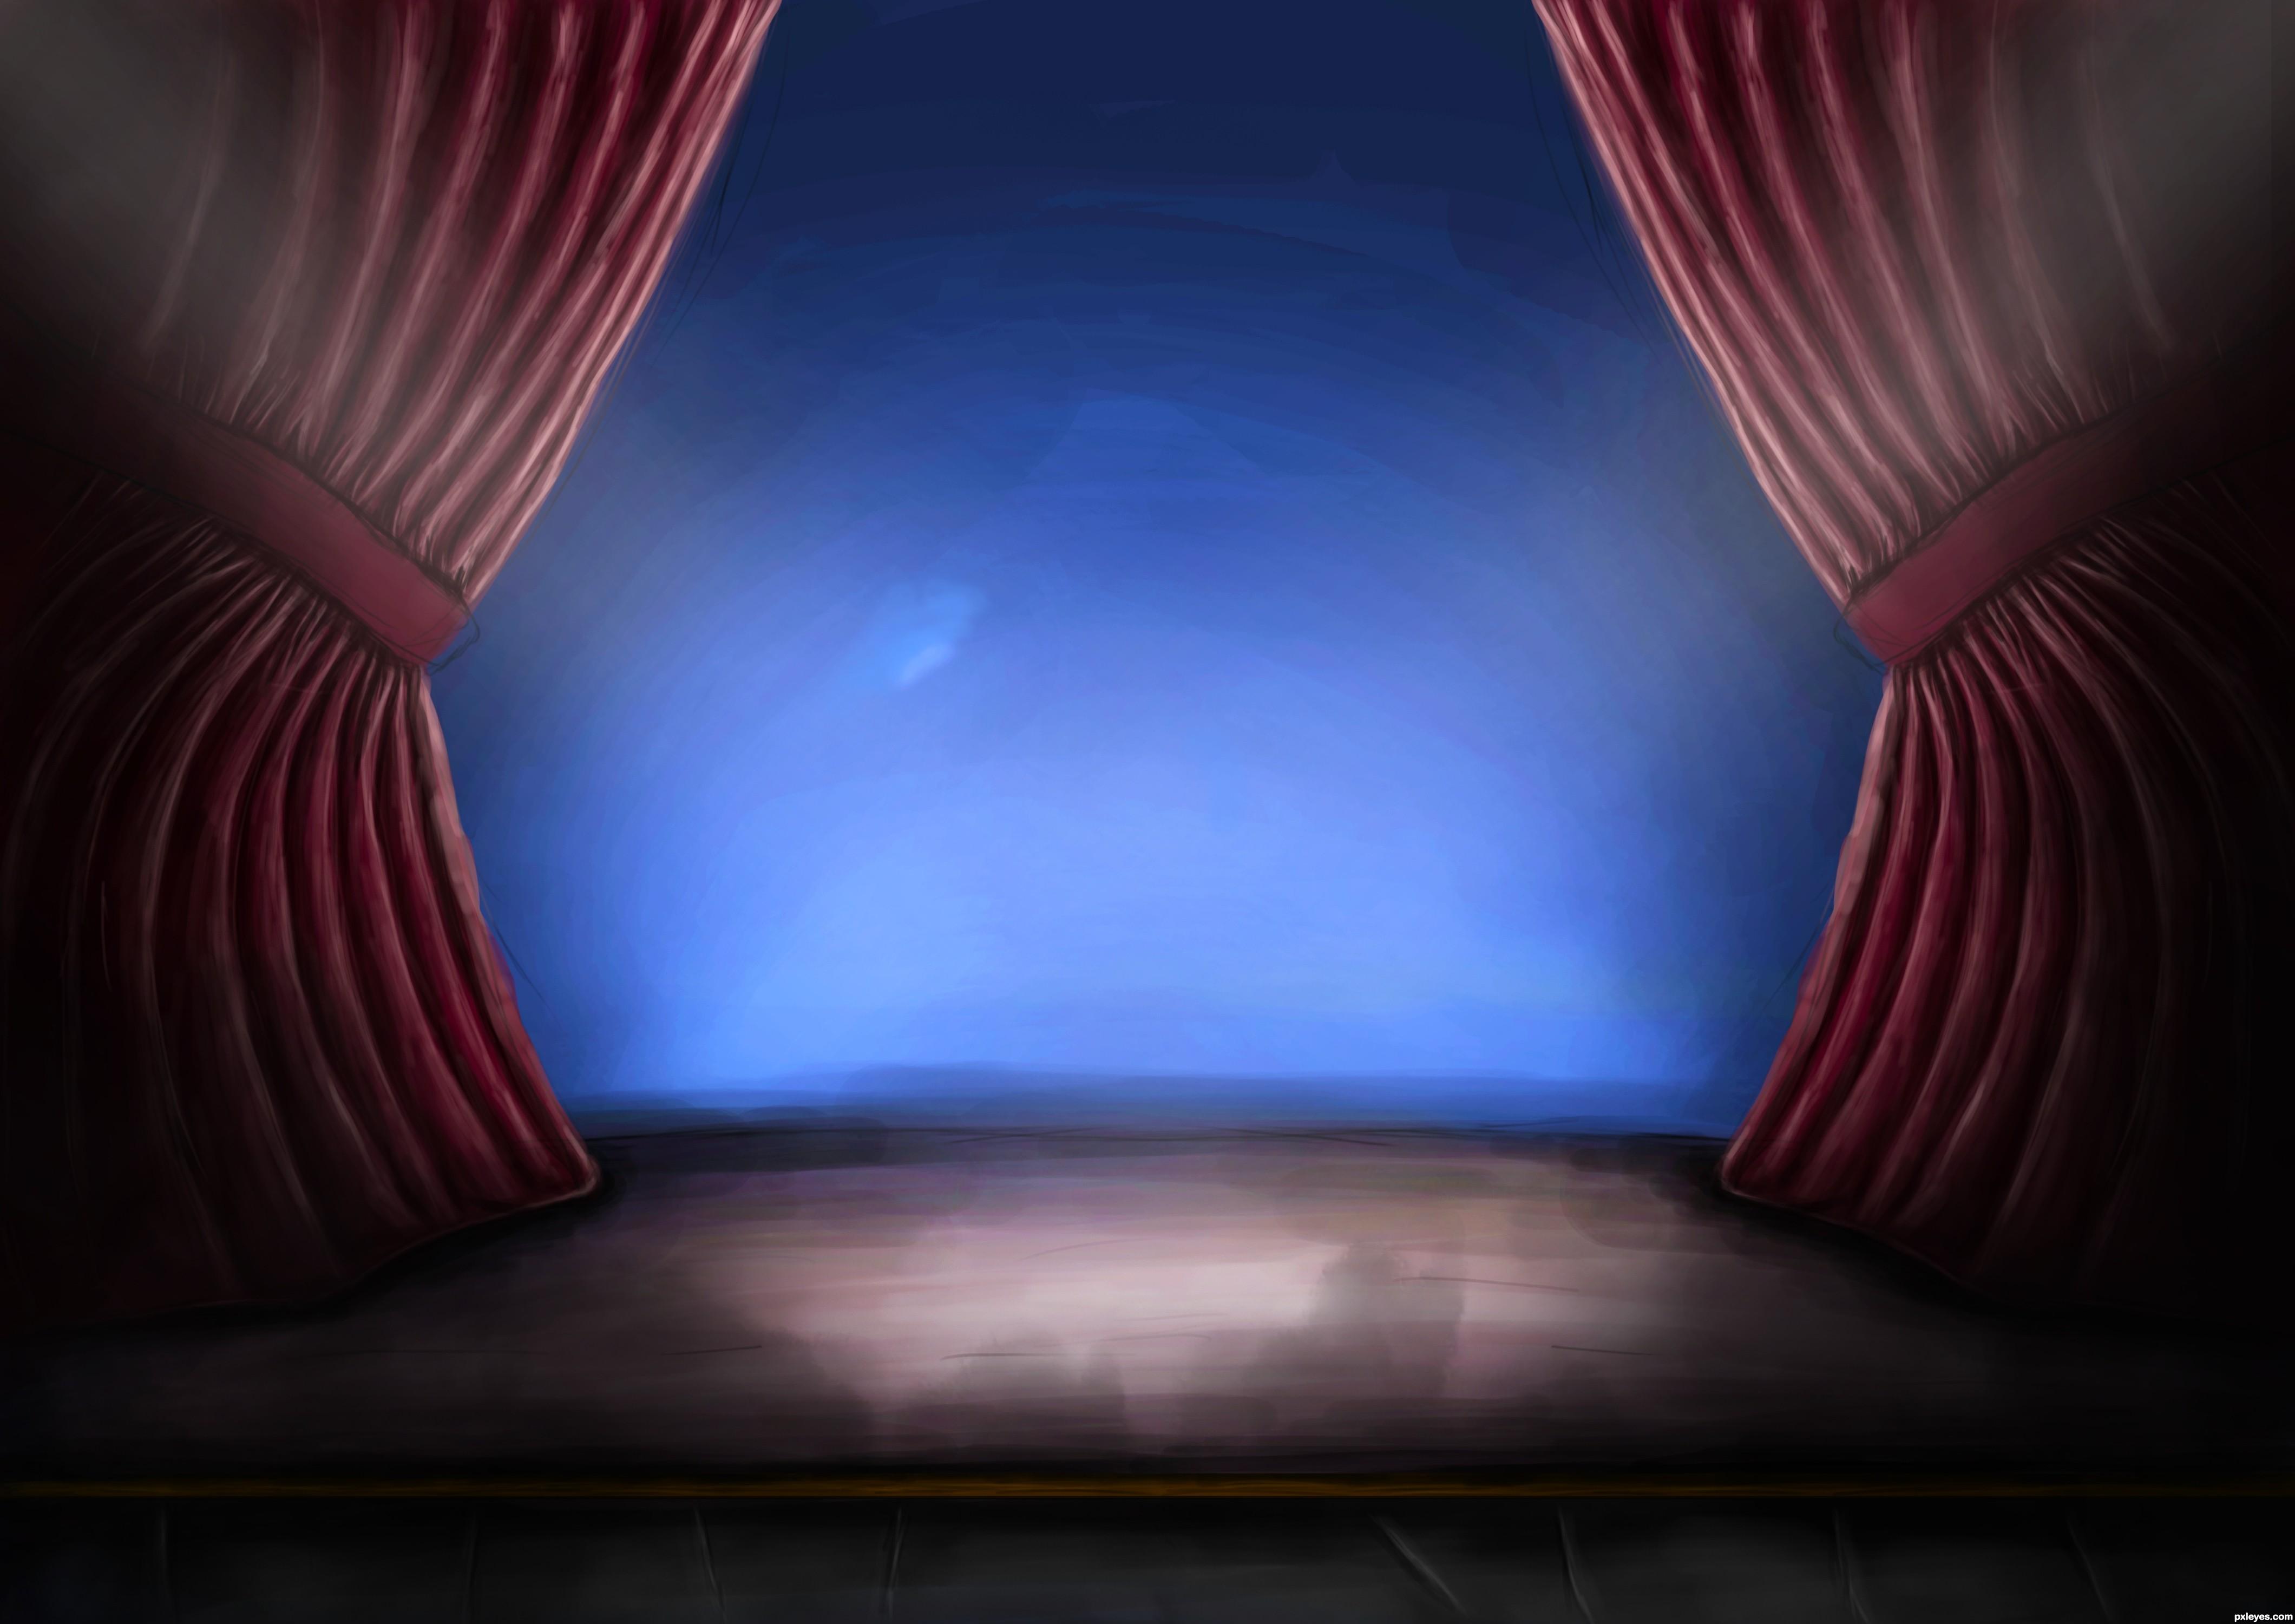 Stage curtain drawing - Stage Curtain Drawing Related Keywords Amp Suggestions